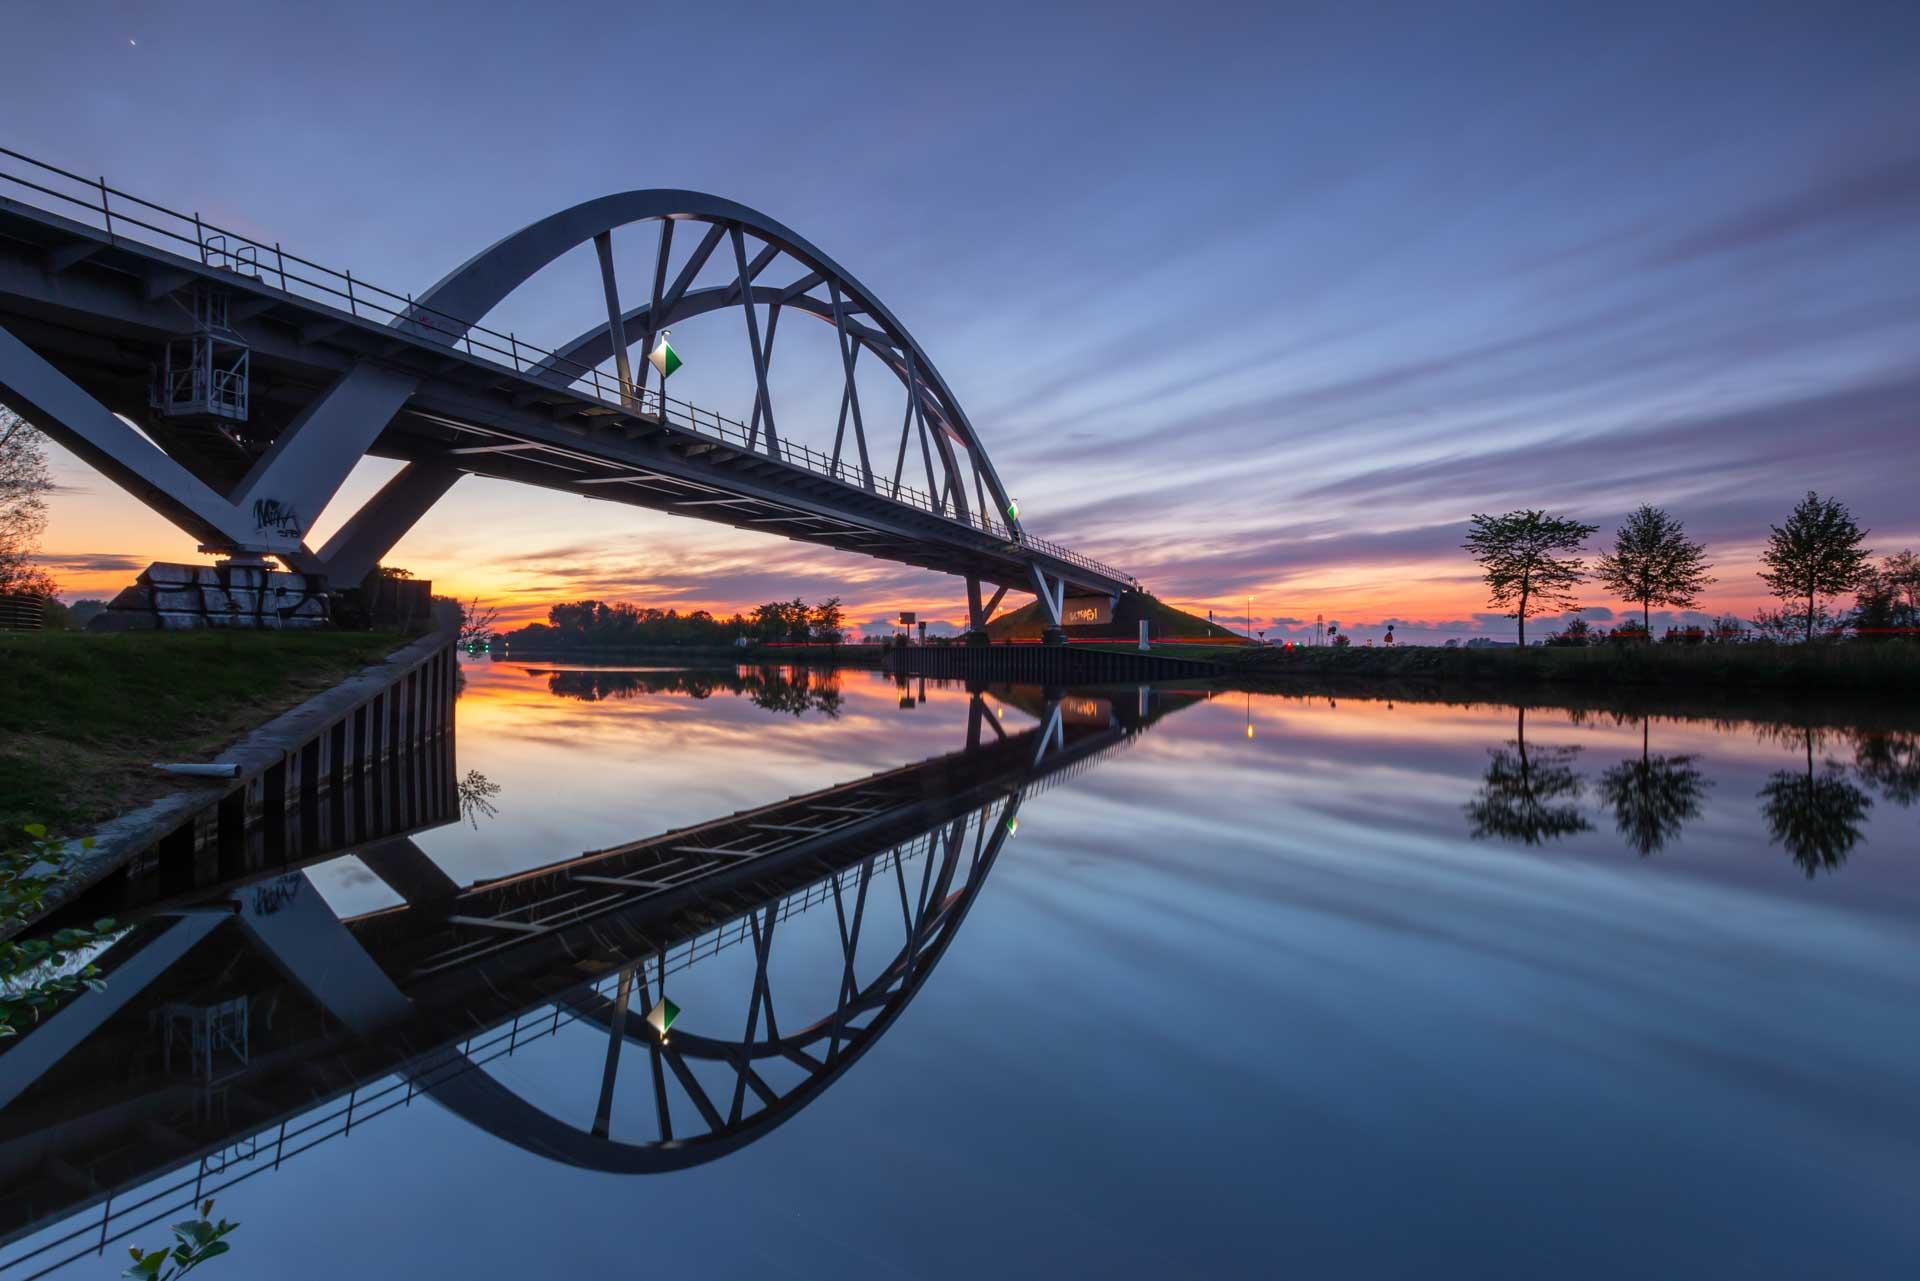 Pascal Teschner Walfridusbrug starkenborghkanaal Groningen